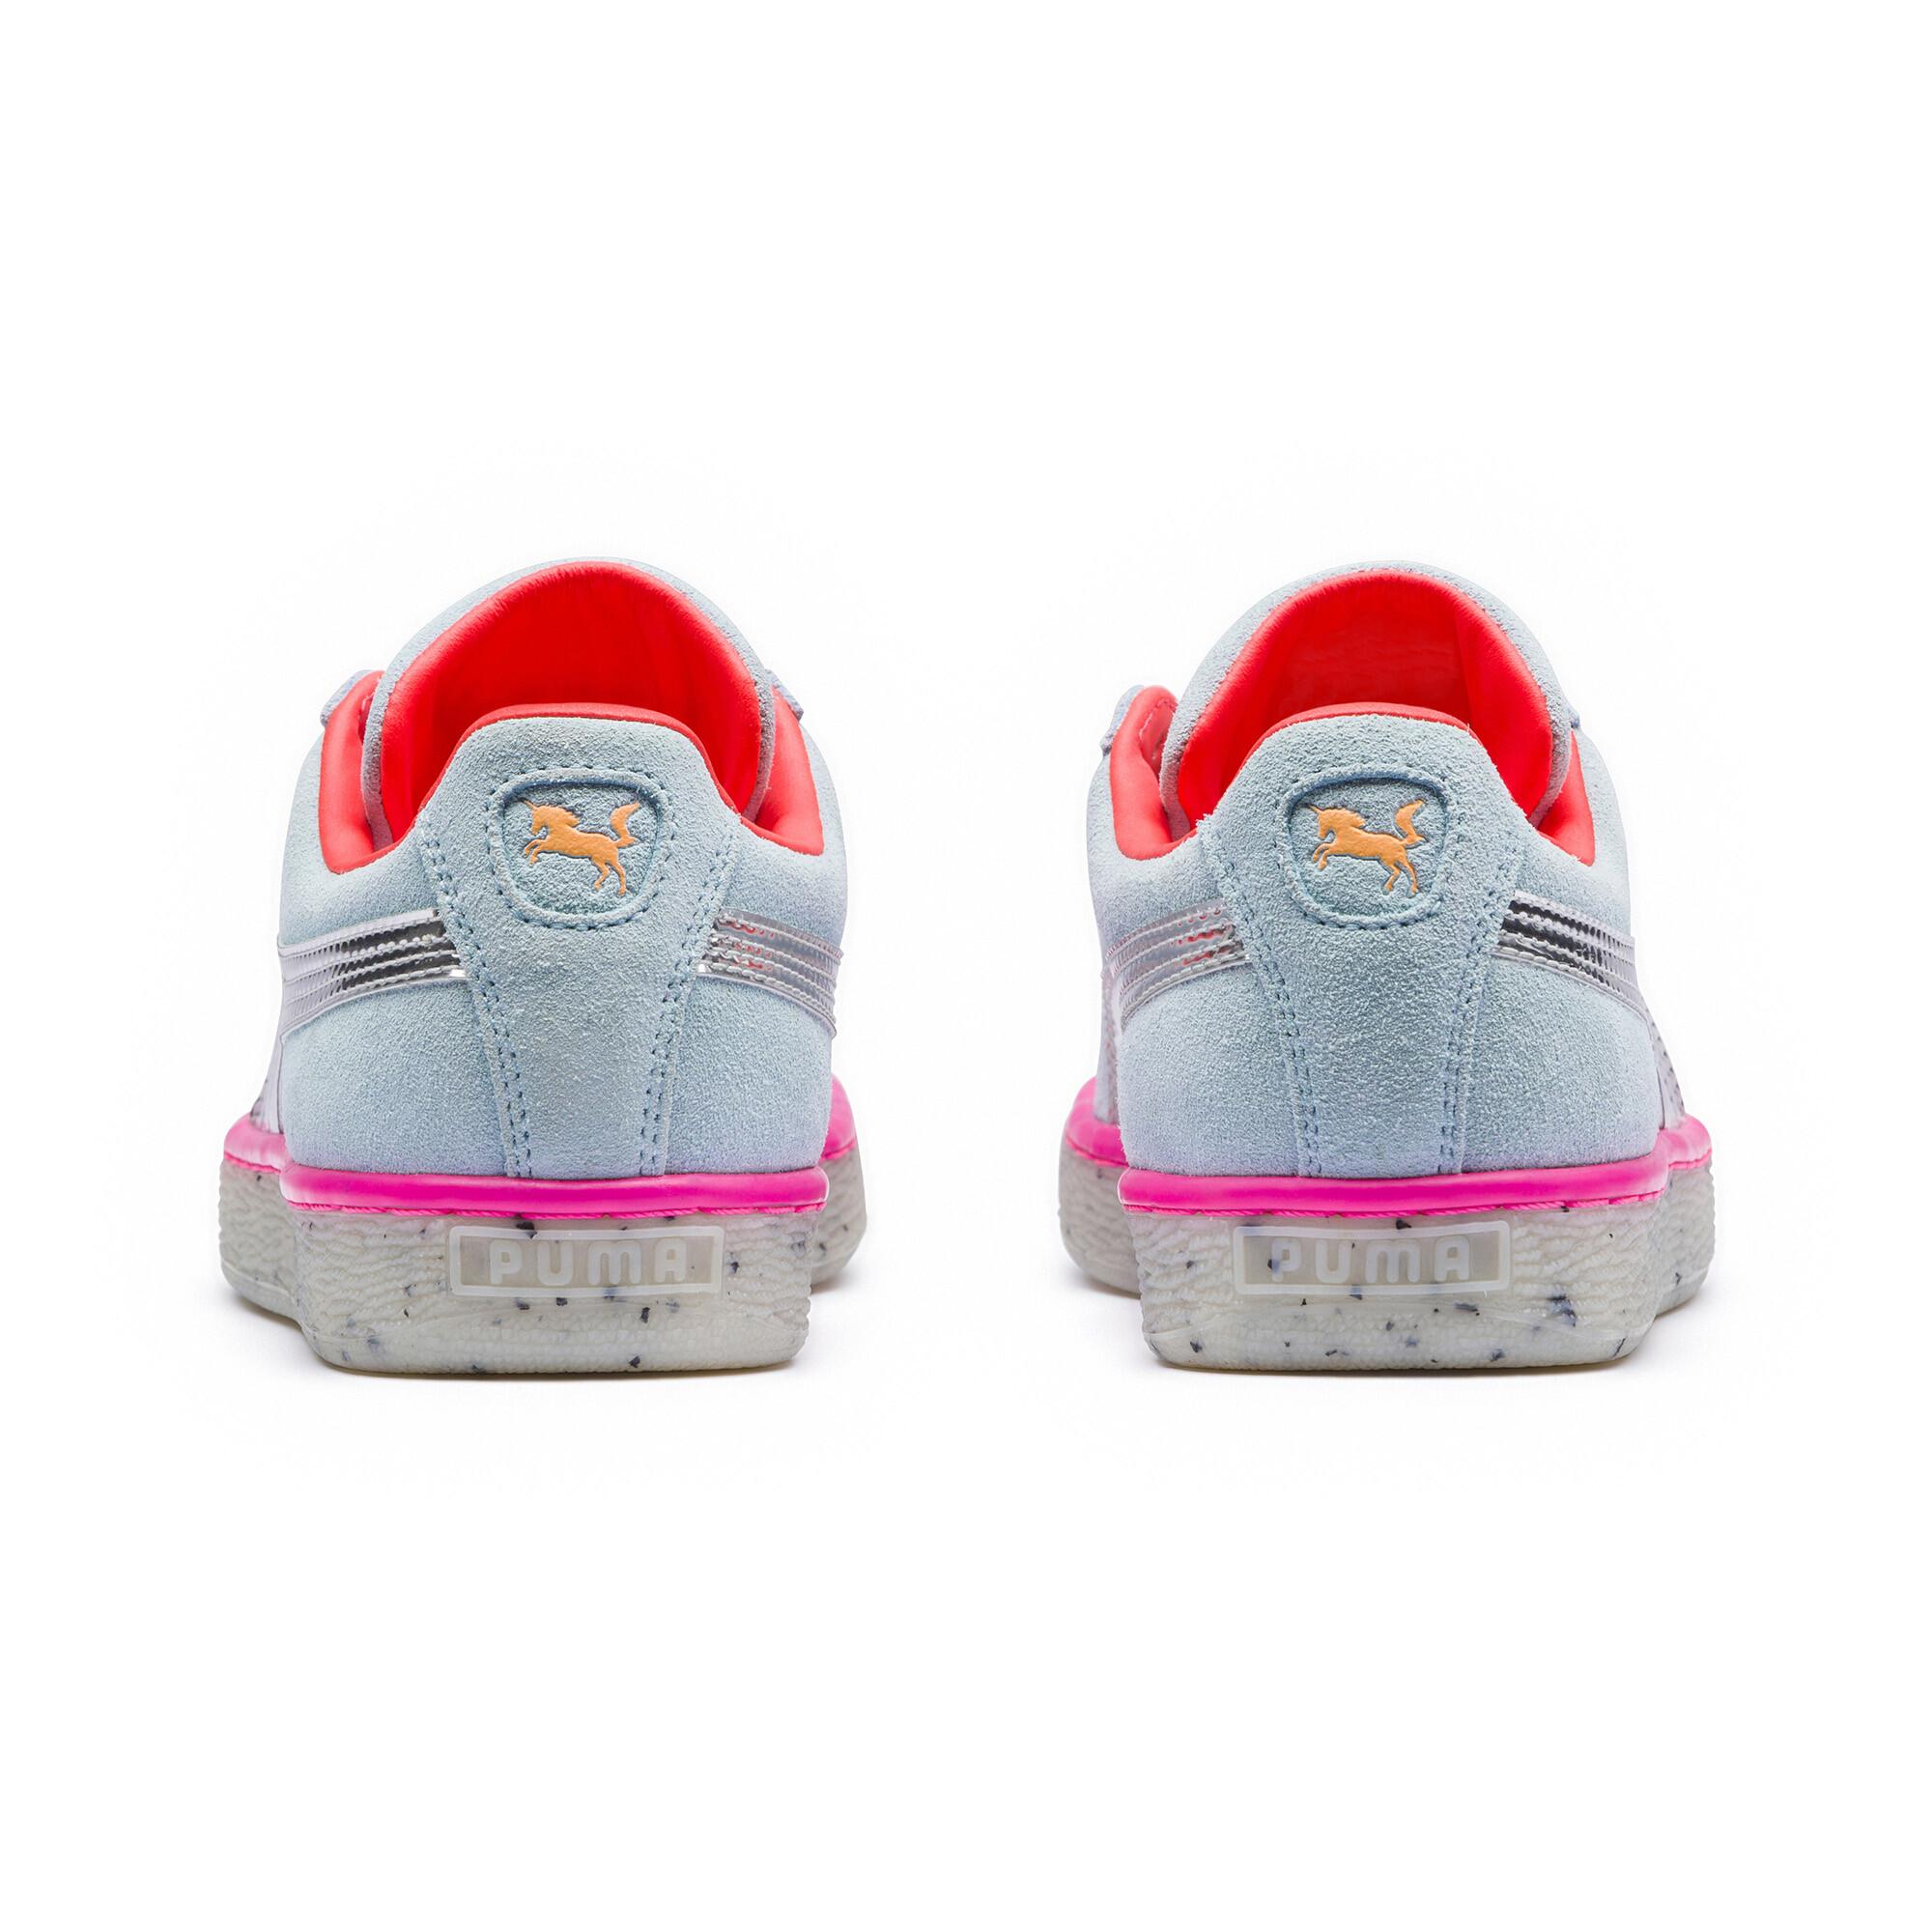 Image Puma PUMA x SOPHIA WEBSTER Women's Suede Candy Princess Sneakers #4